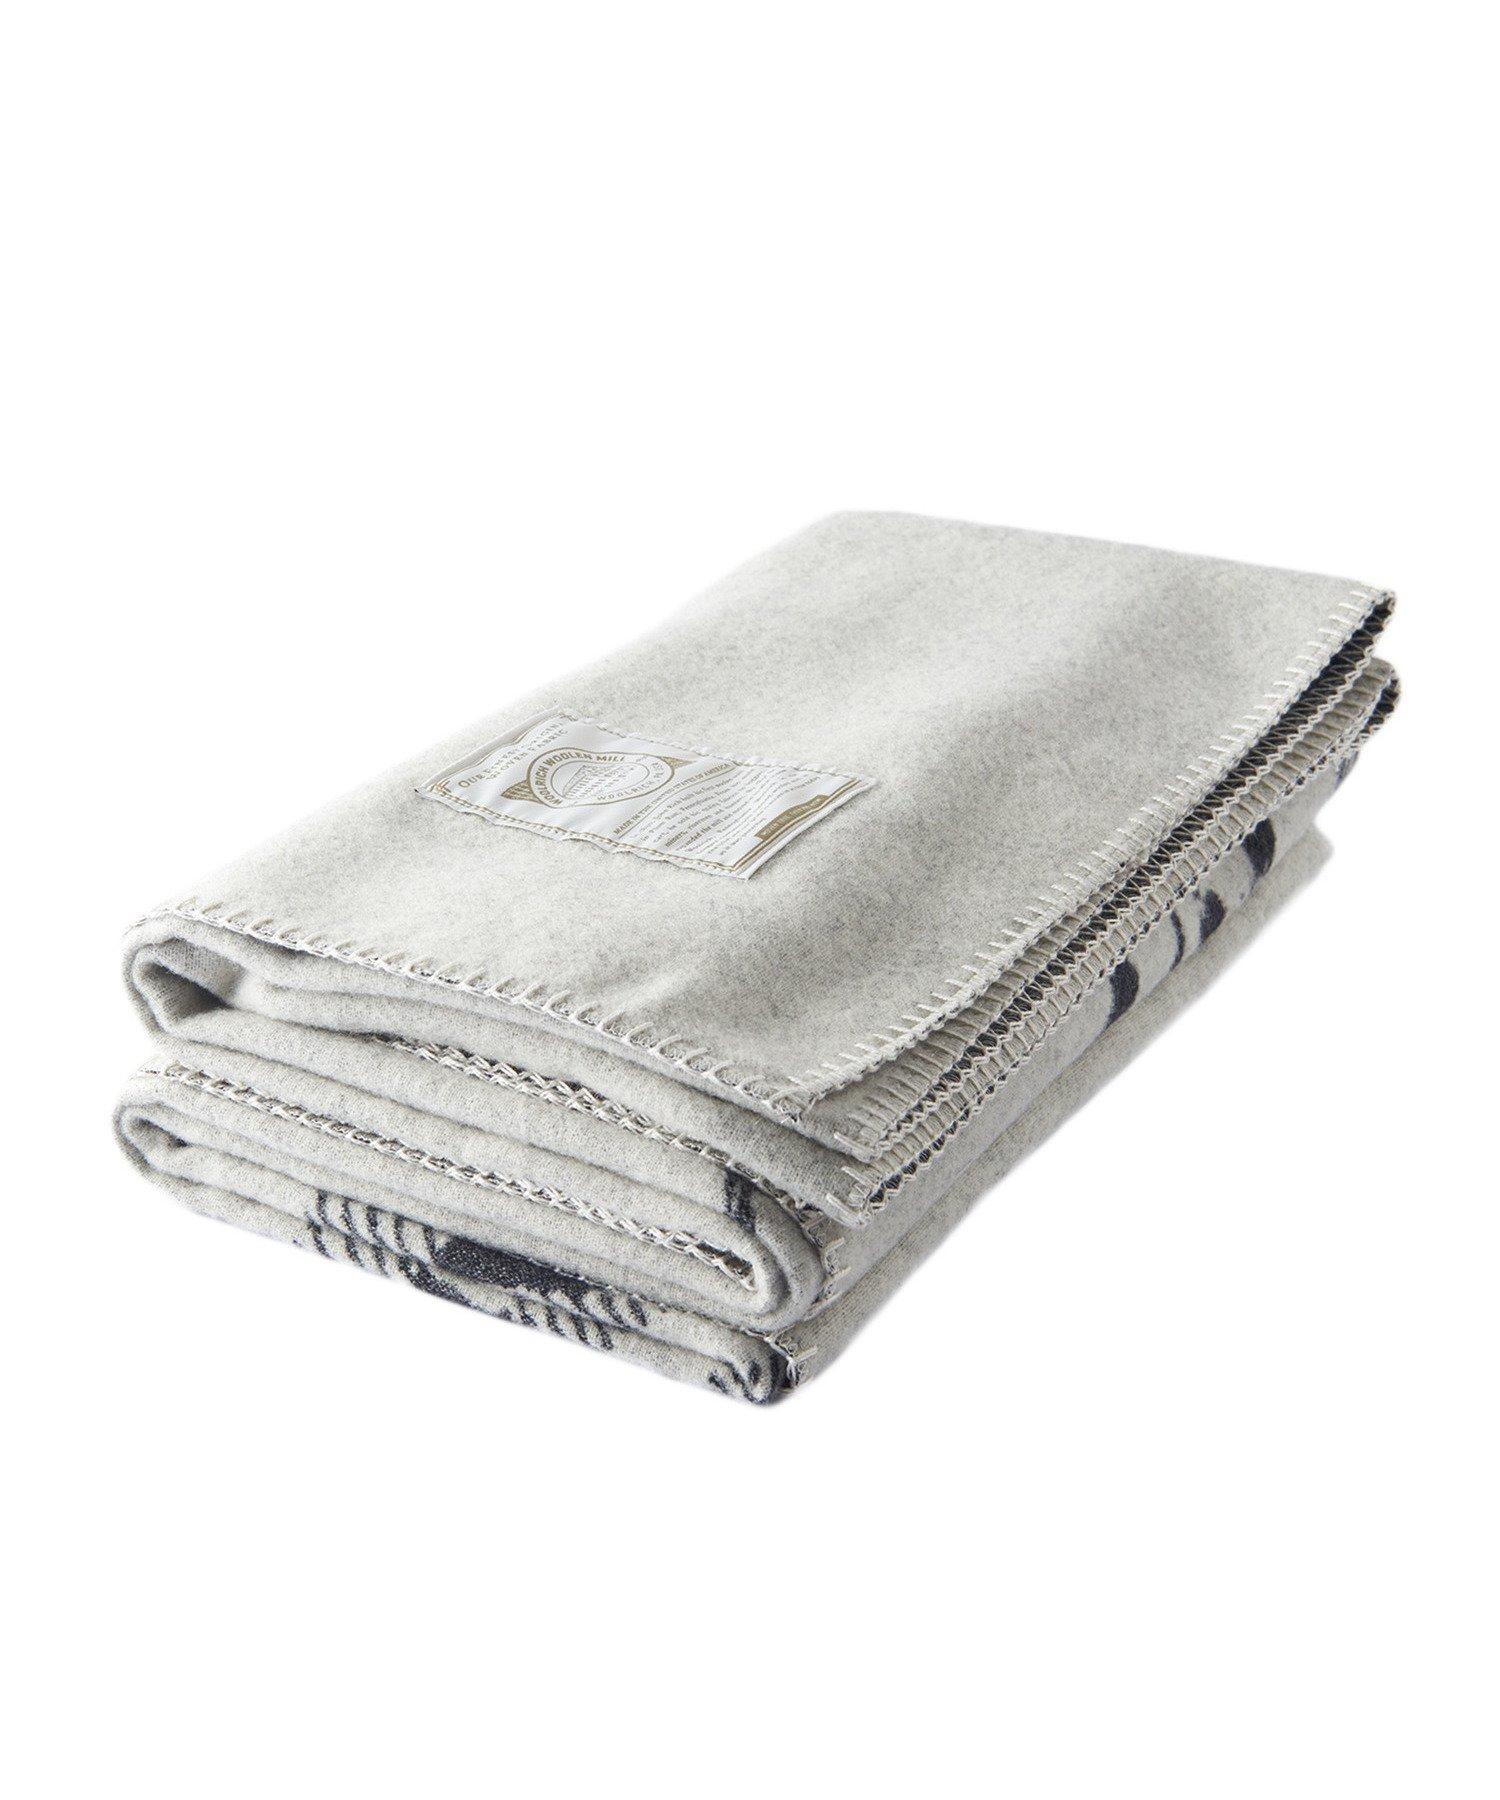 Woolrich 92475 Treverton Jacquard Blanket, Moose-R